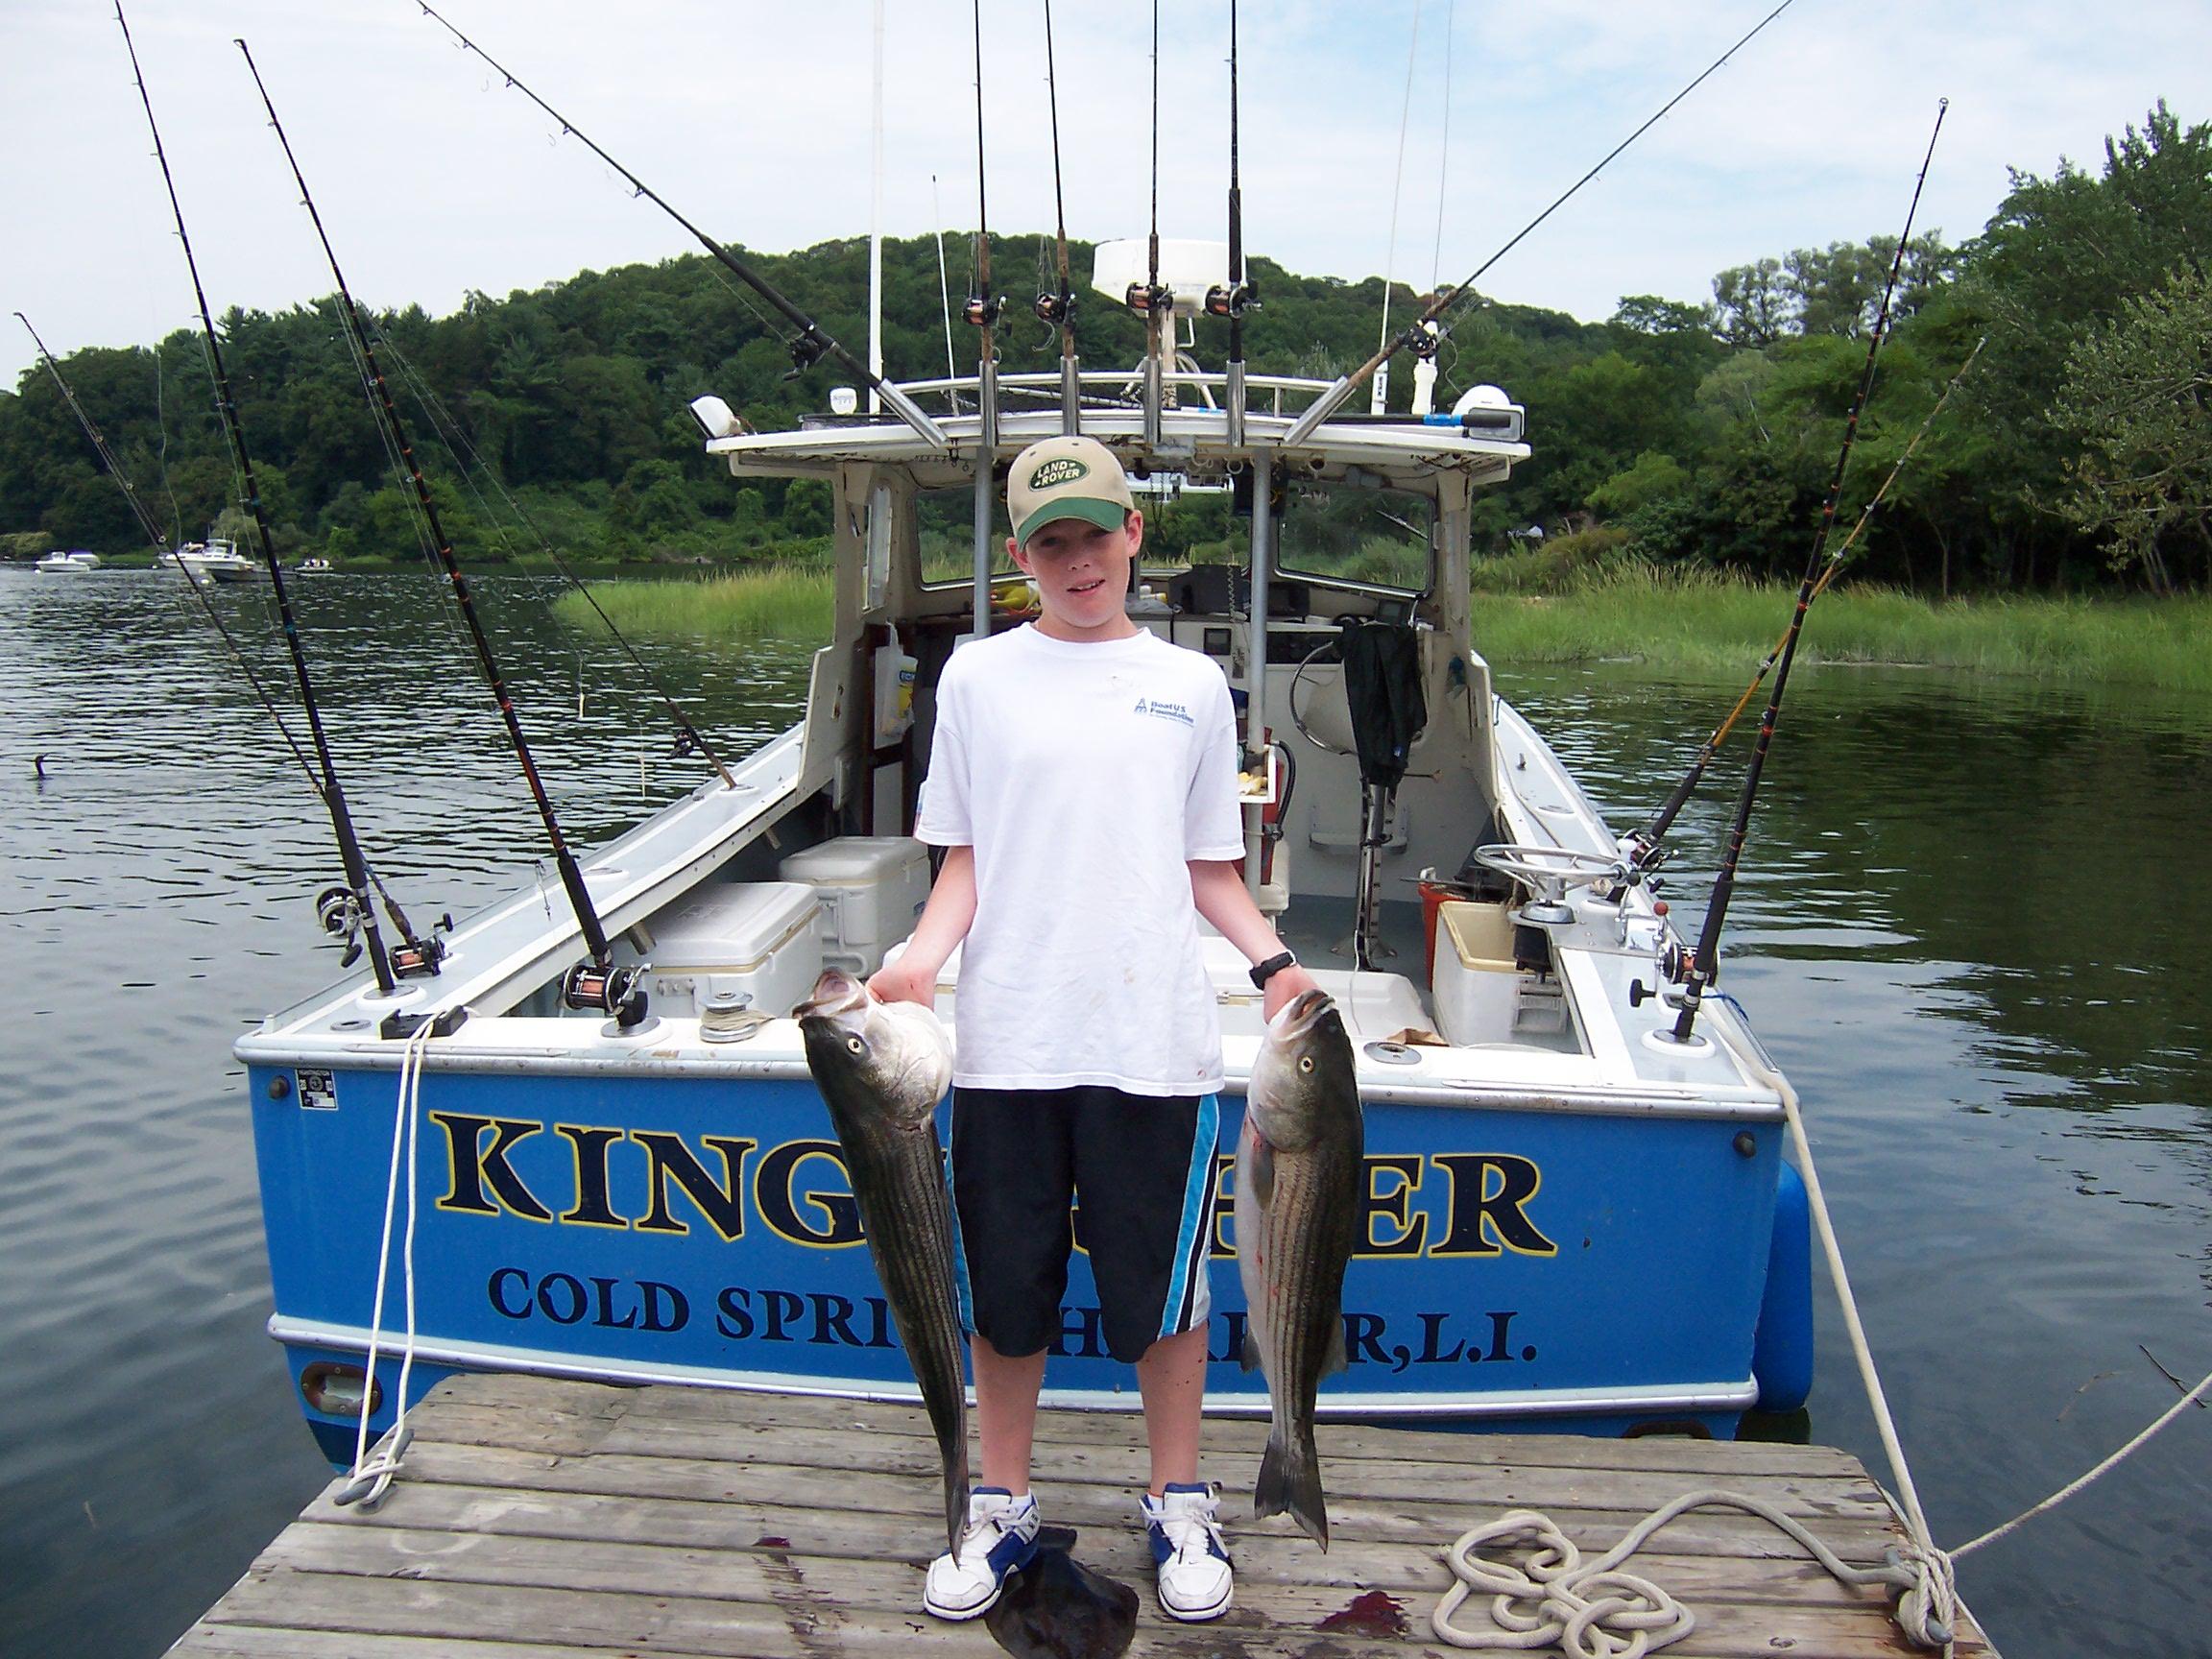 Fishing charters north shore long island sound north for Fishing boats long island